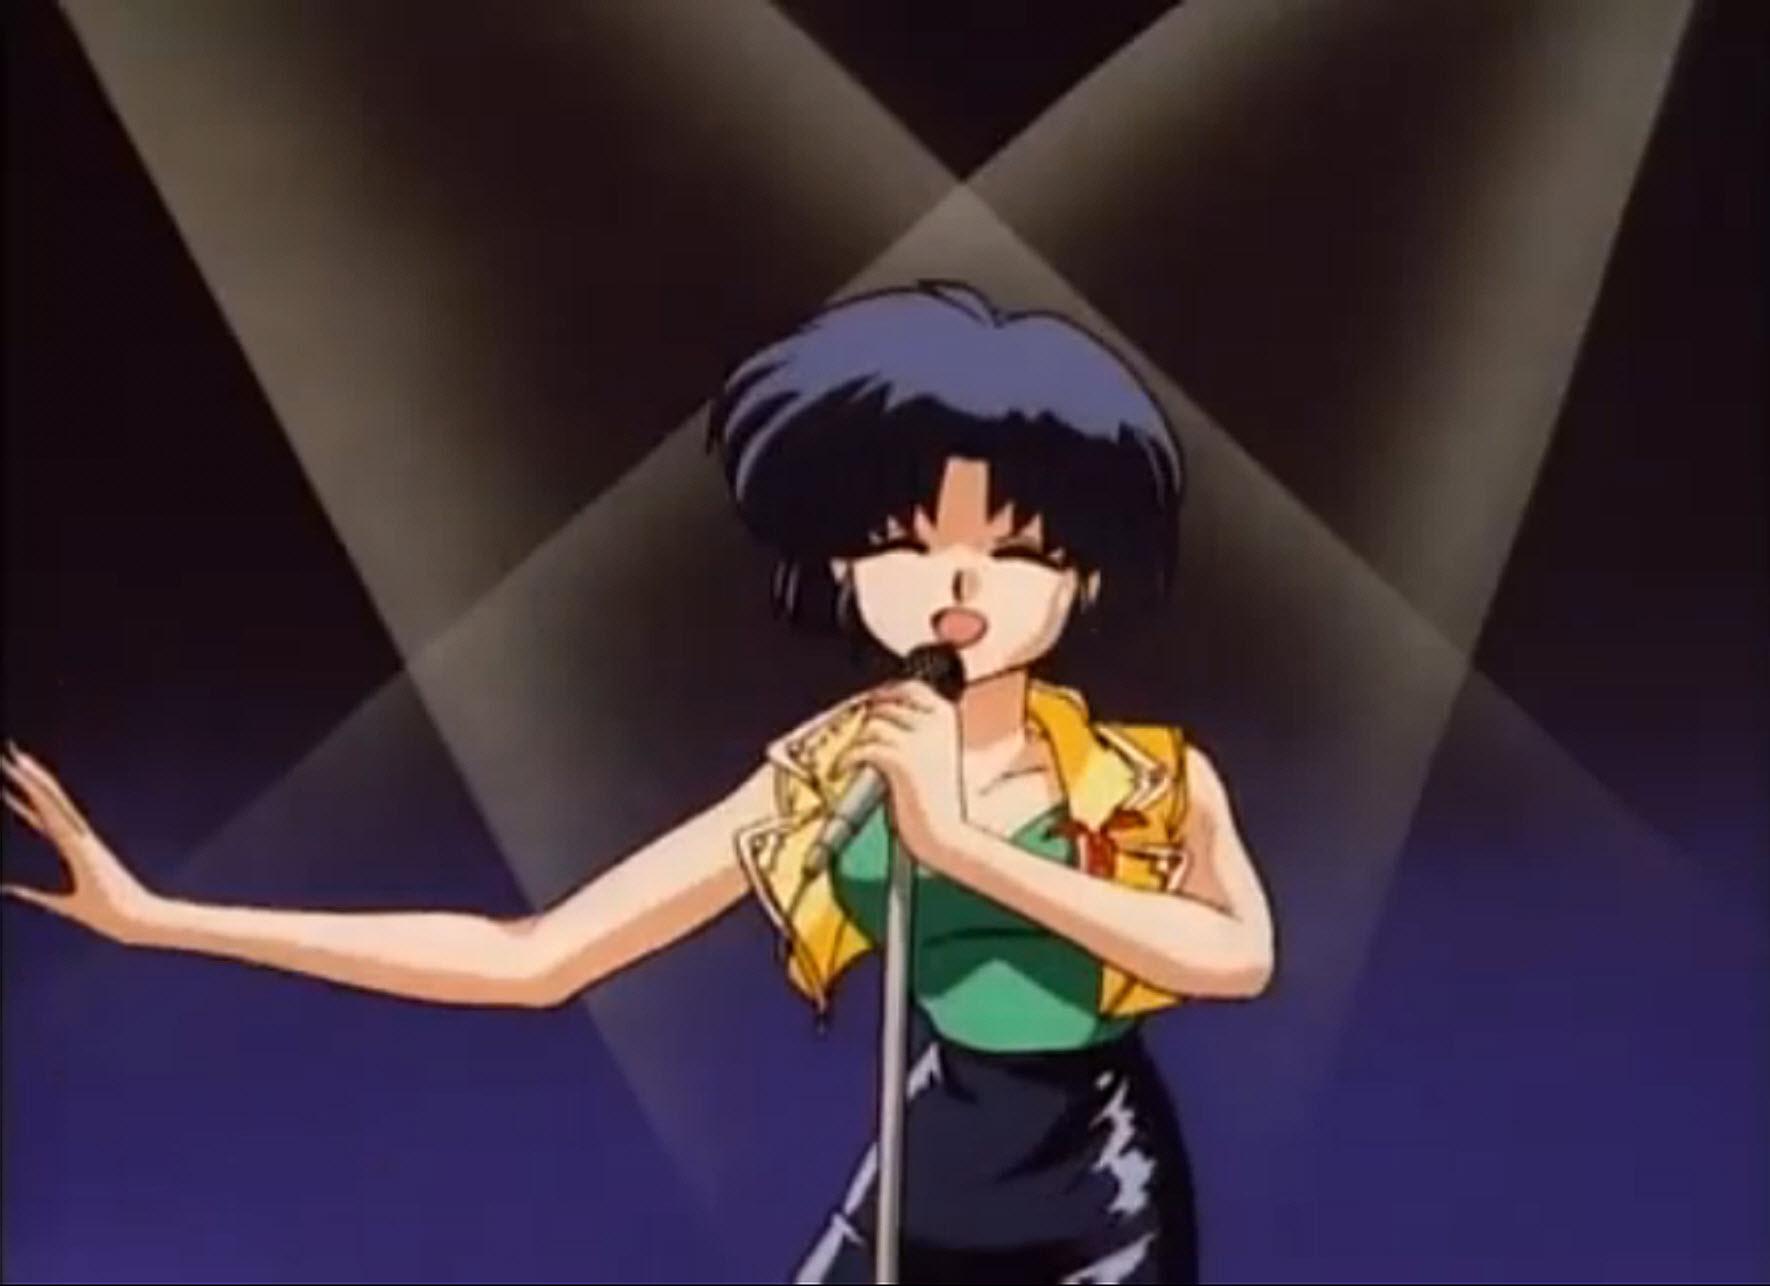 Ranma 1 2 Anime Characters : Ranma characters akane tendo image